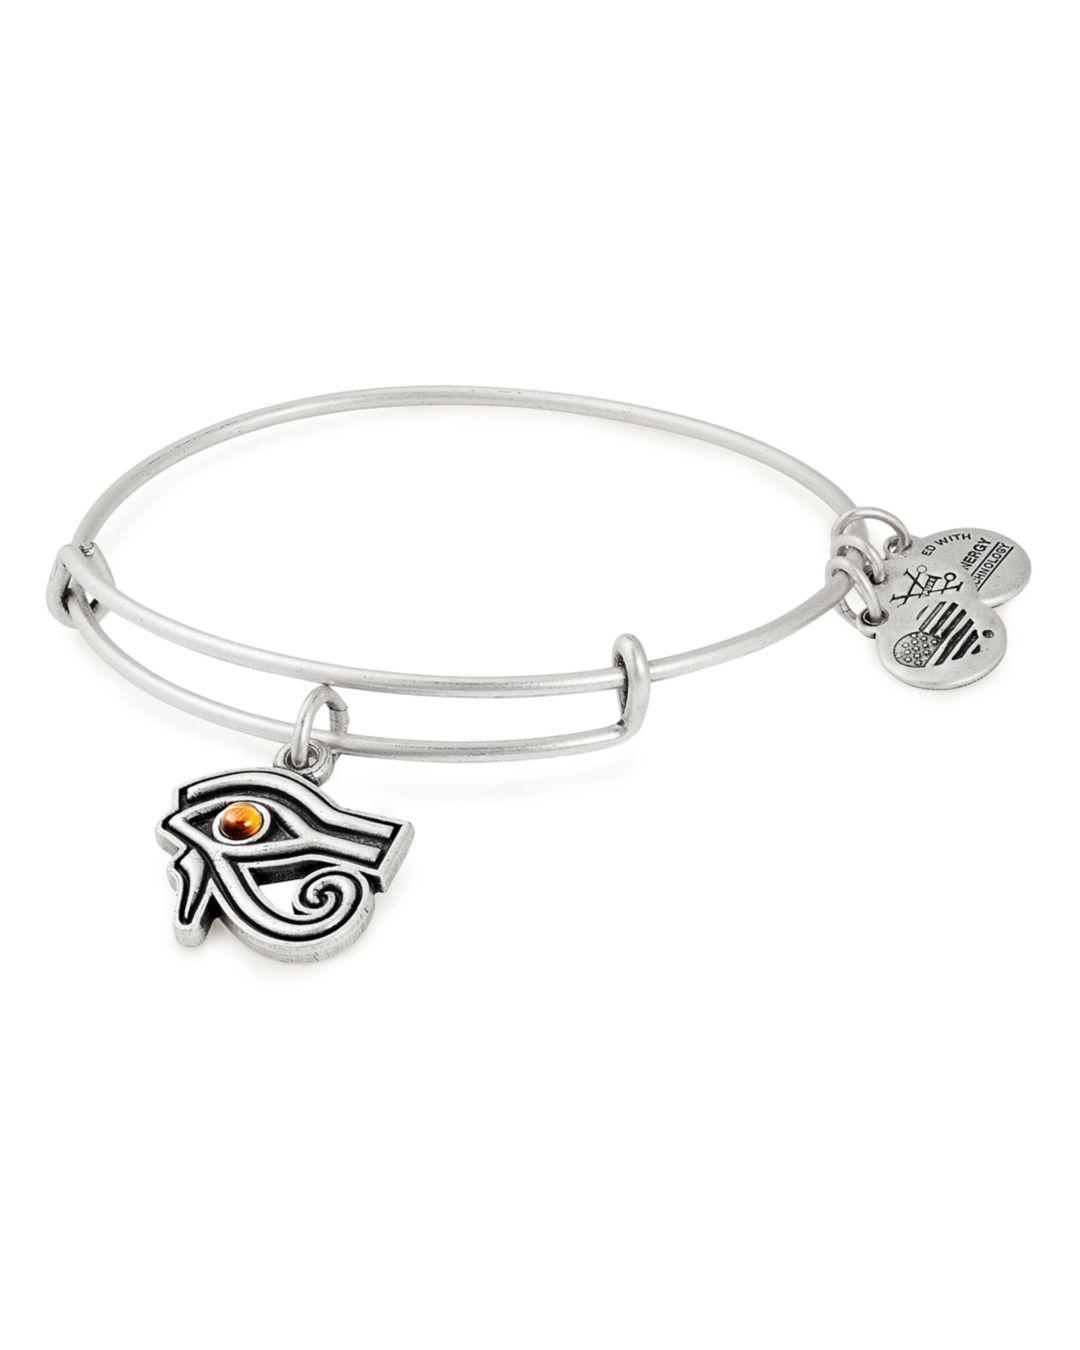 Expandable Alex and Ani Womens Eye of Horus EWB Bangle Bracelet